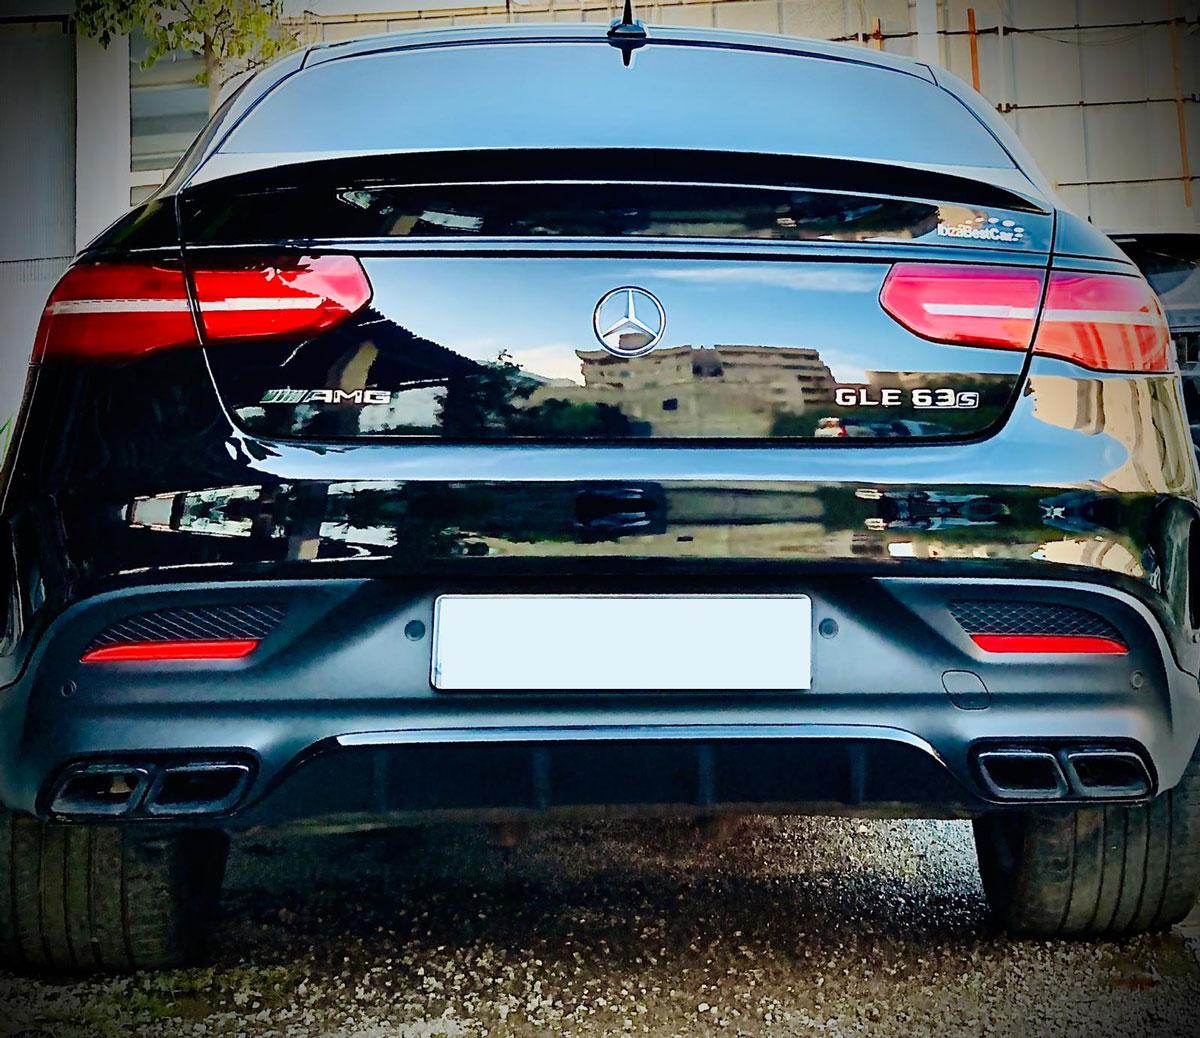 Mercedes GLE 63S Amg Rental Ibiza